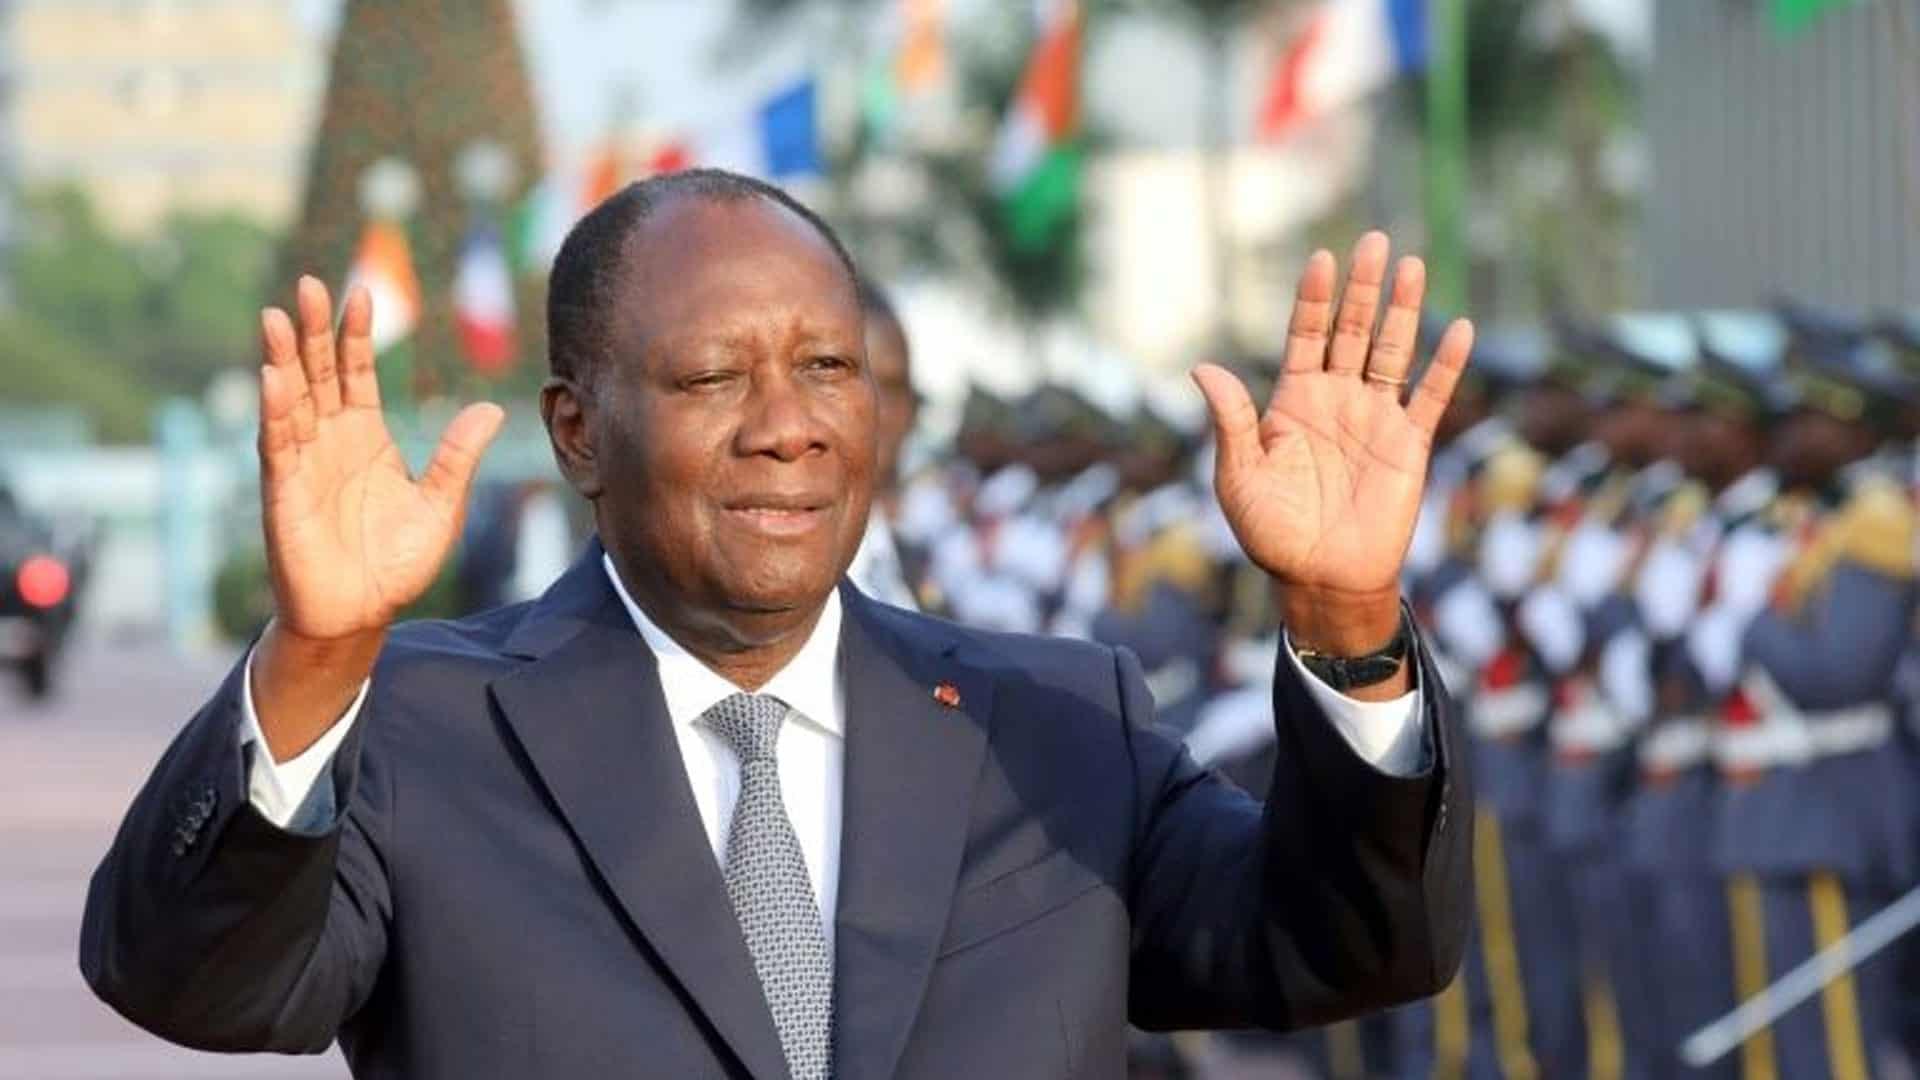 Ivory Coast President Scores Landslide Win, Opposition Cries Foul